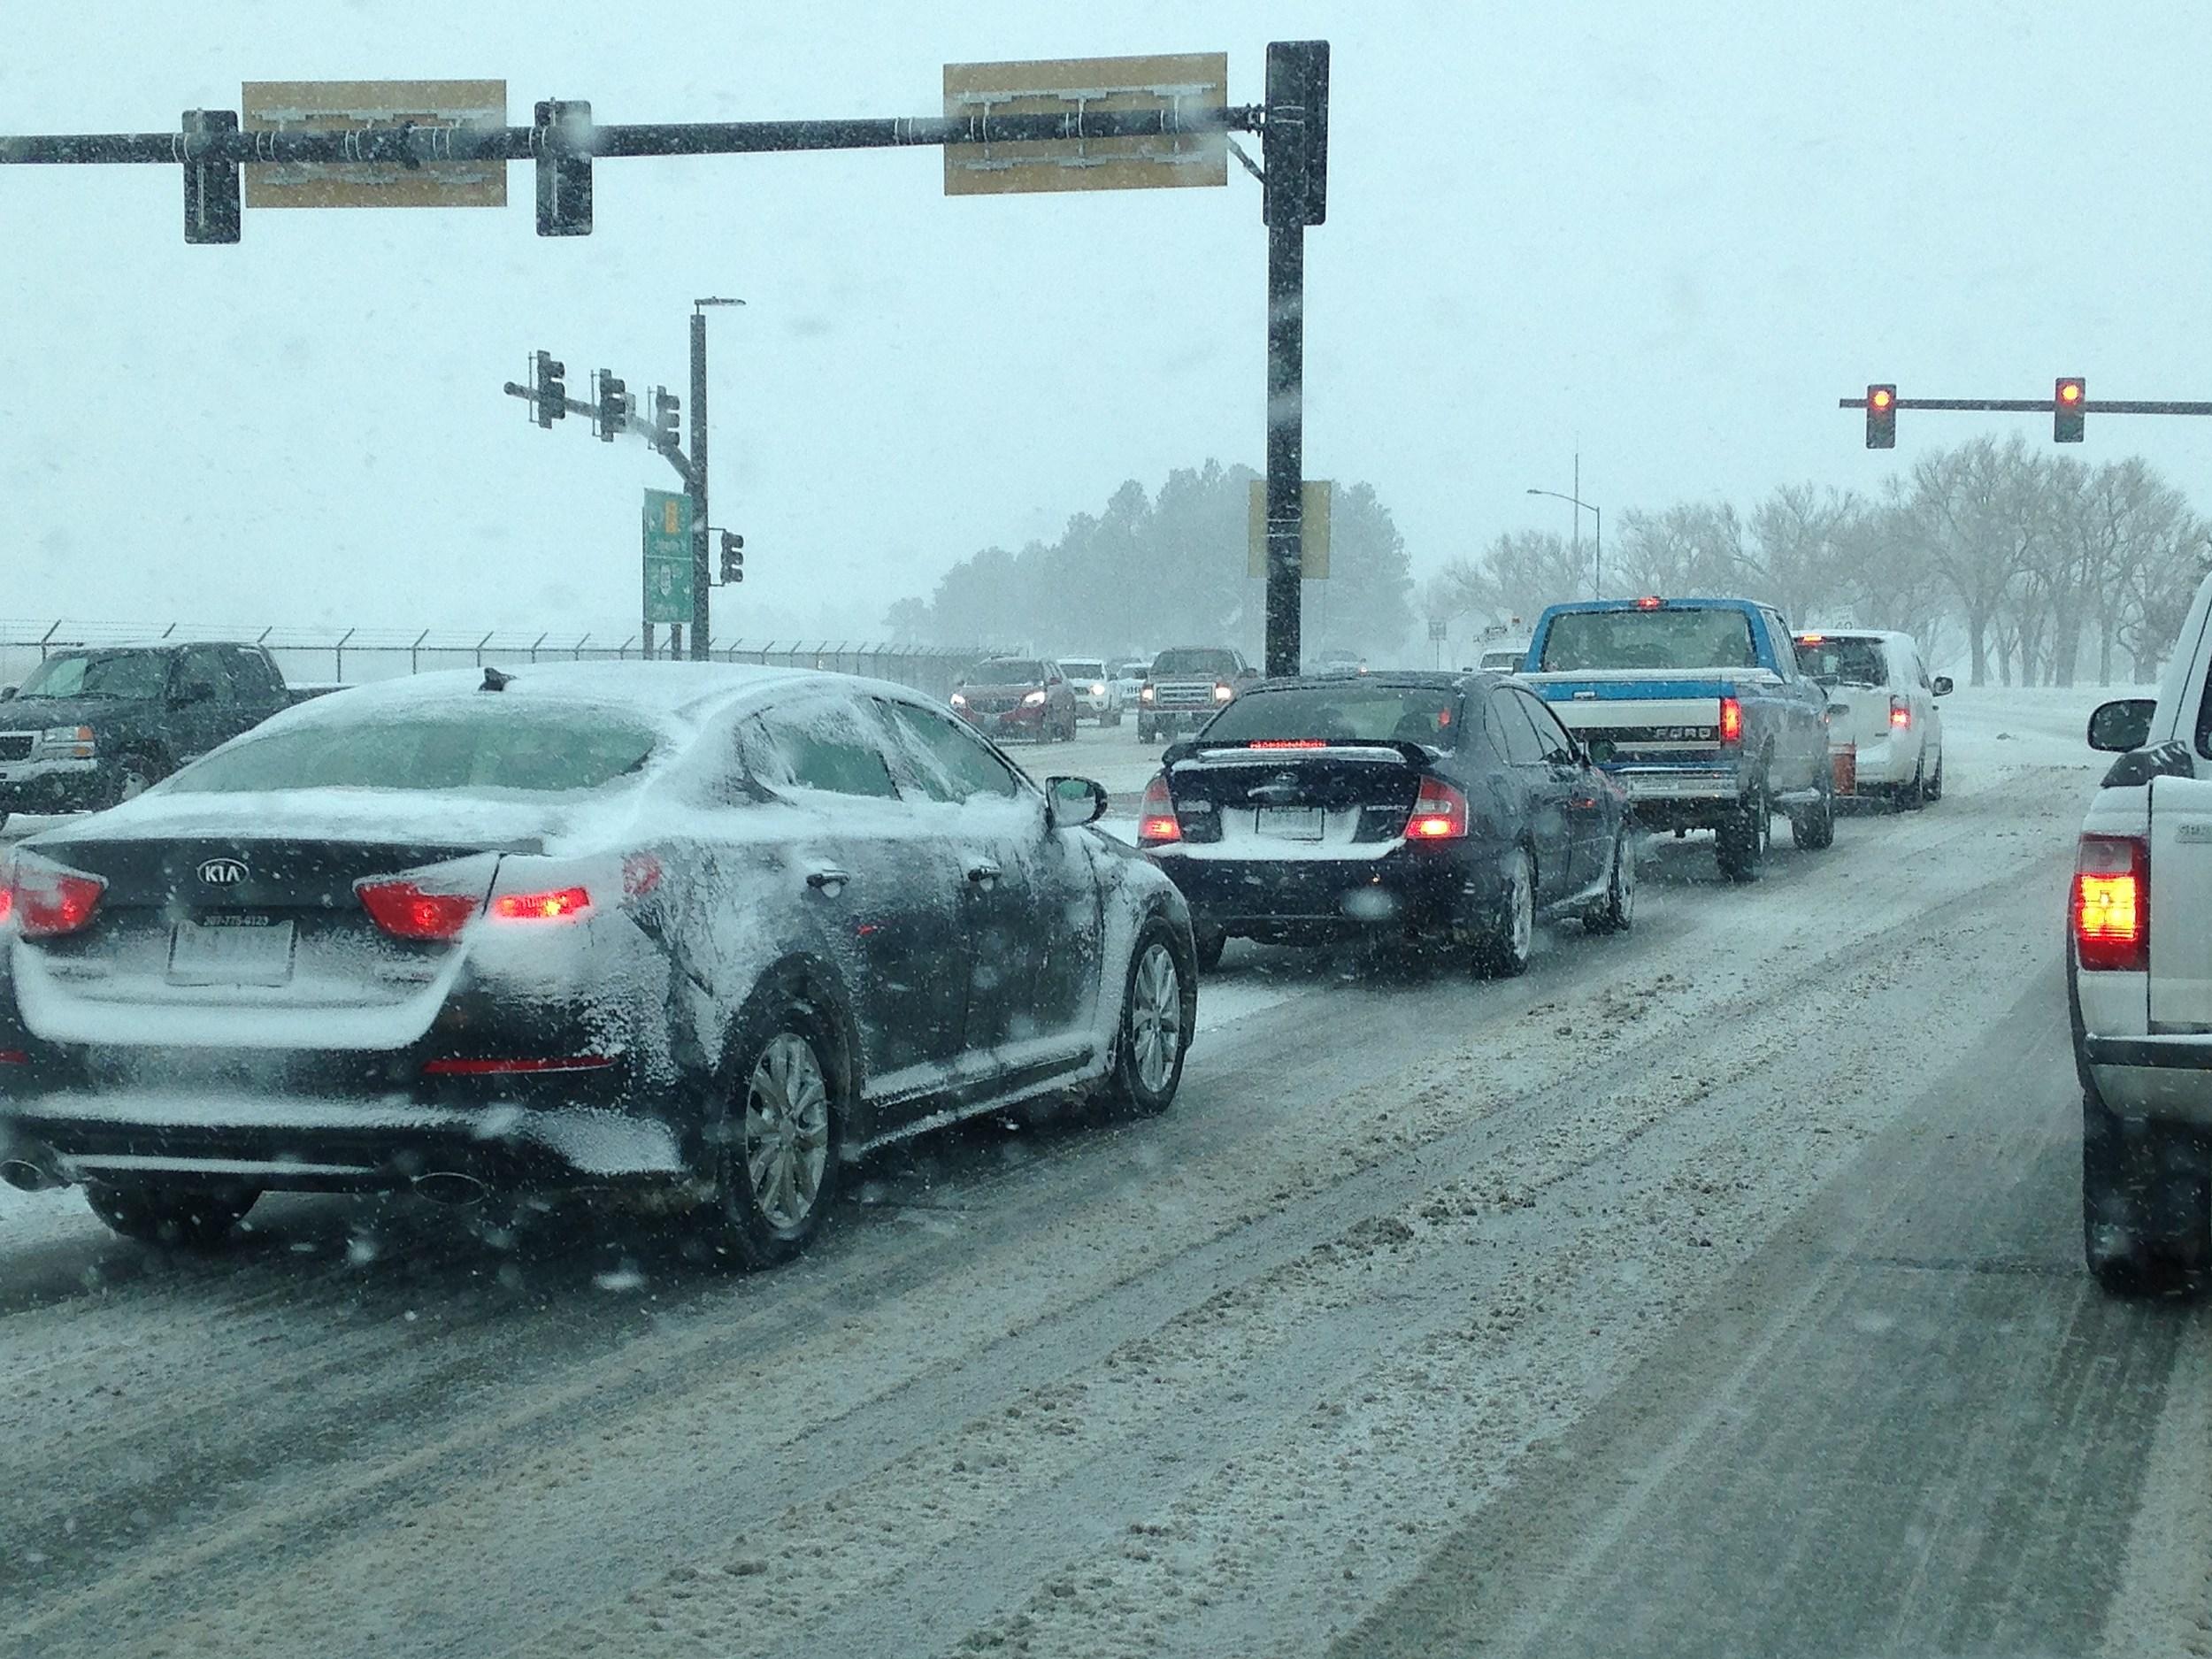 Cheyenne Facing Winter Weather Advisory